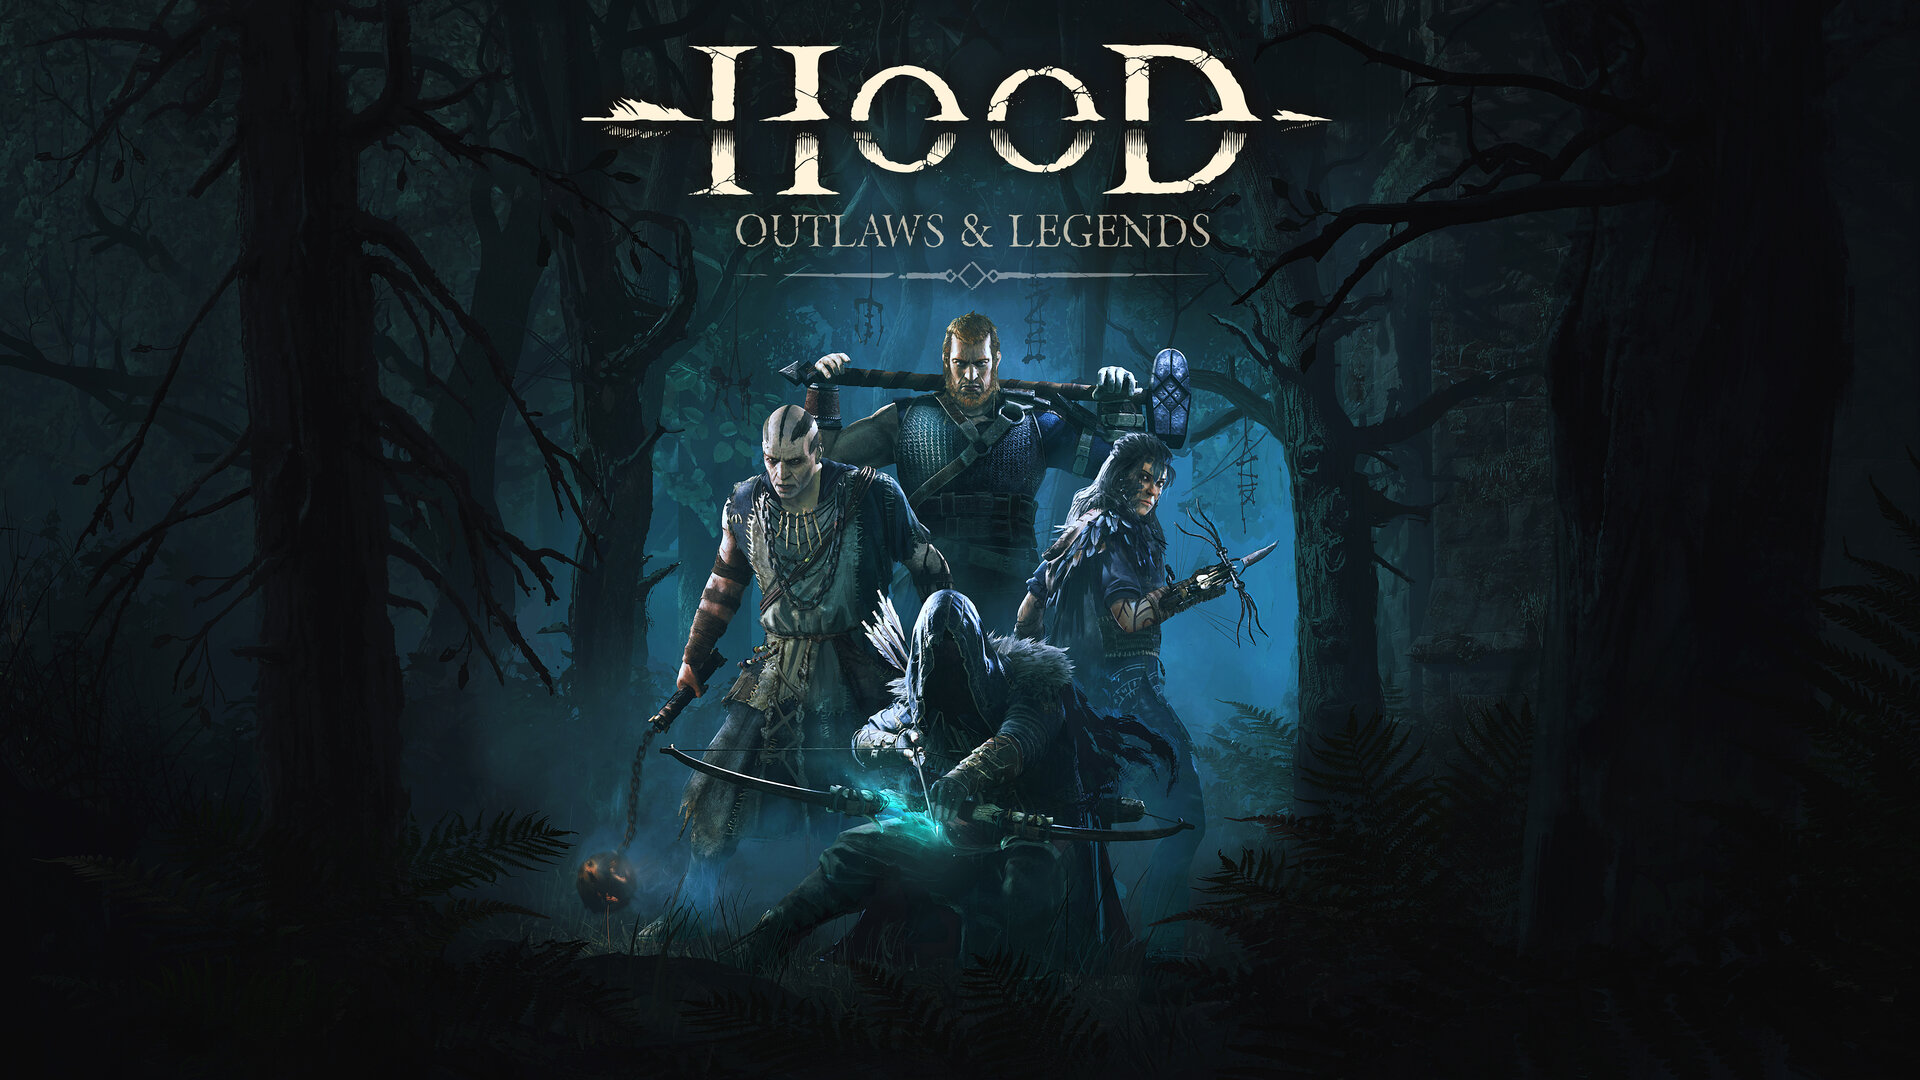 Hood-outlaws-2